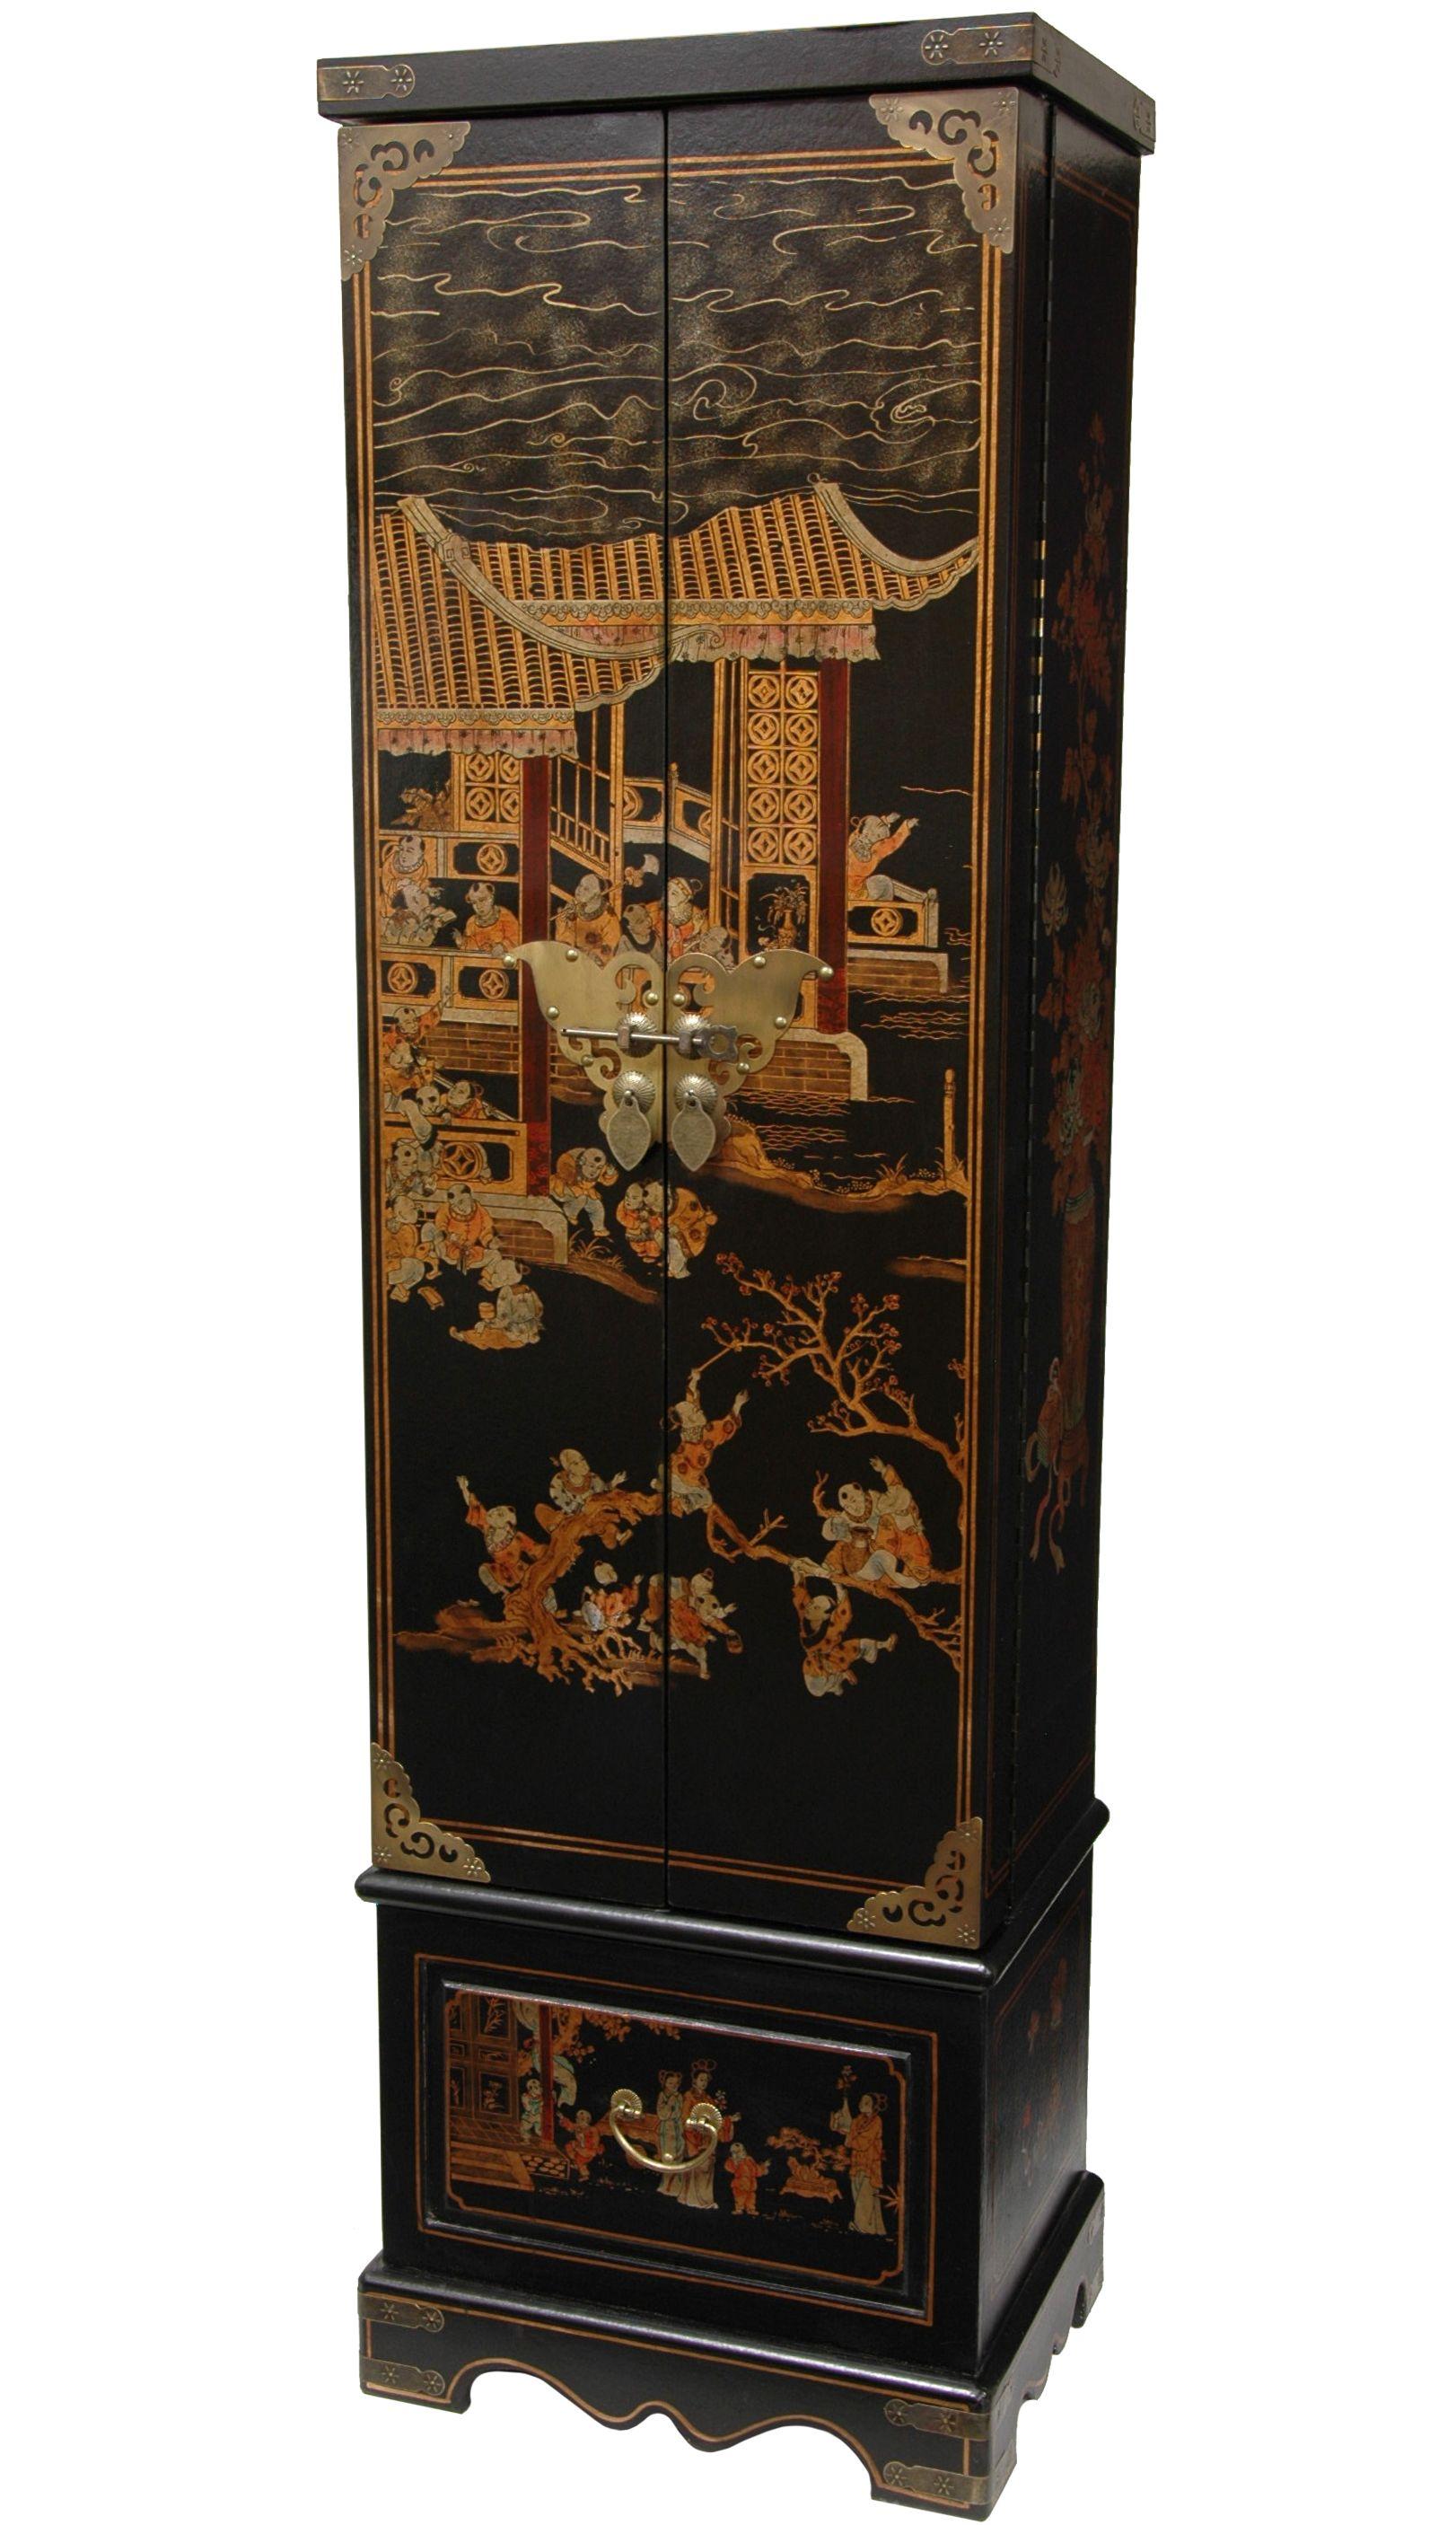 oriental jewelry armoire Description Extra tall jewelry armoire